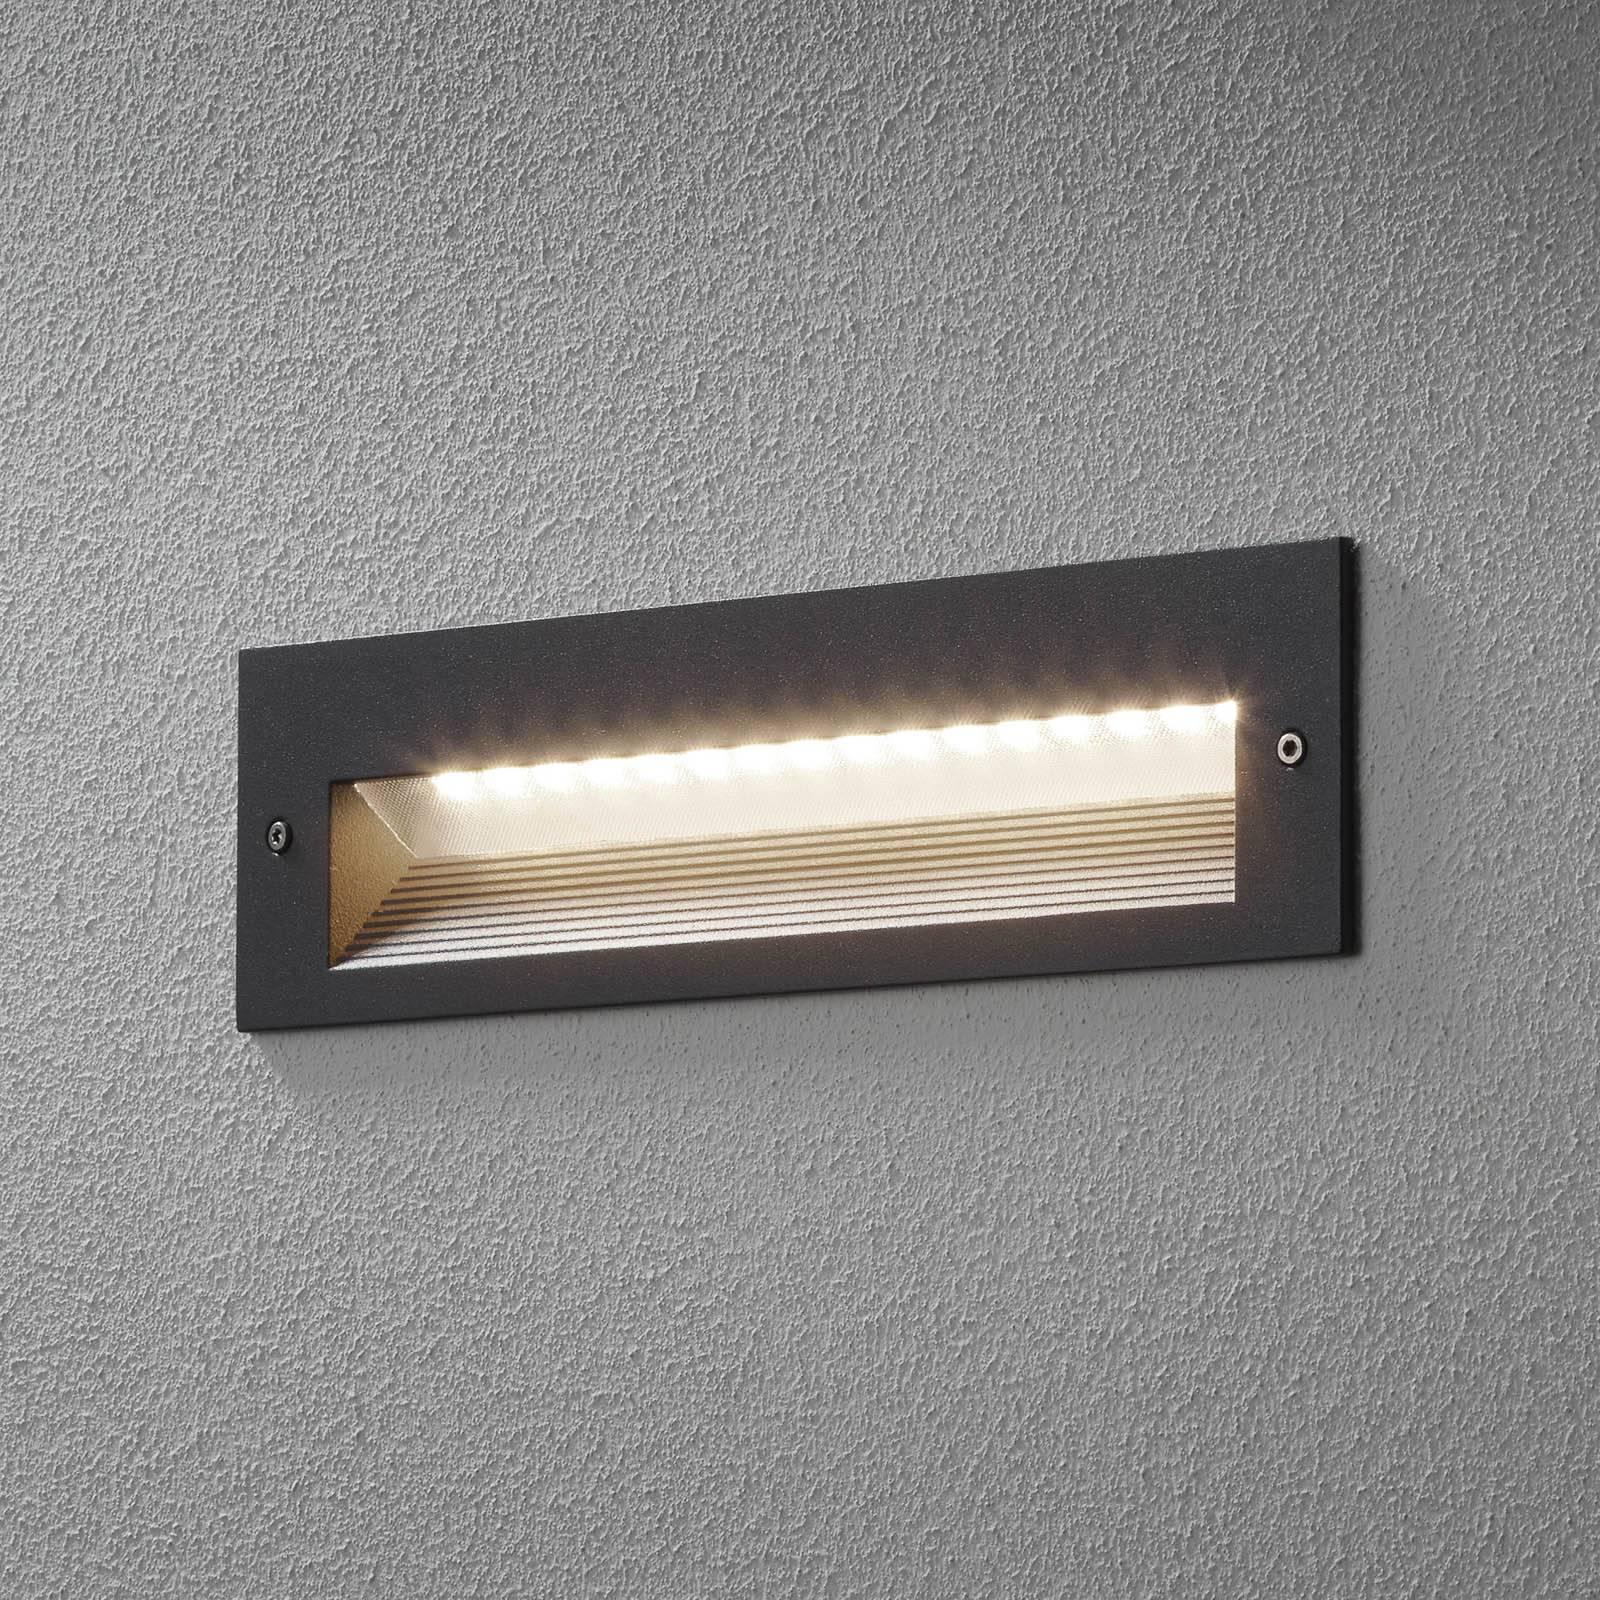 BEGA 33054 LED-seinäuppovalo 3000K grafiitti 26 cm